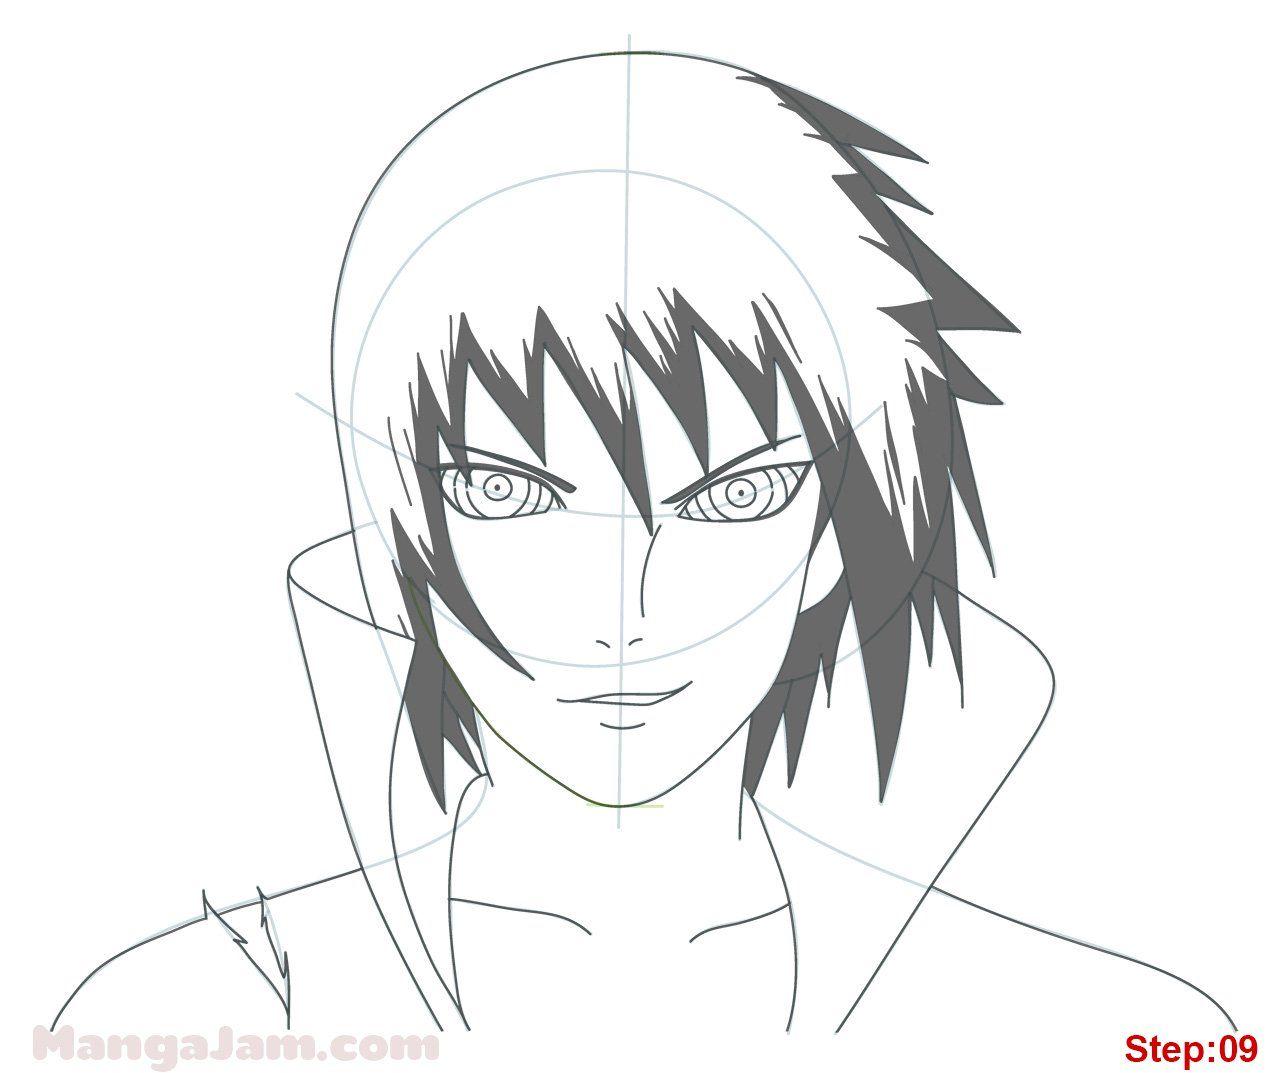 How To Draw Sasuke Rinnegan From Naruto Desenho De Personagens